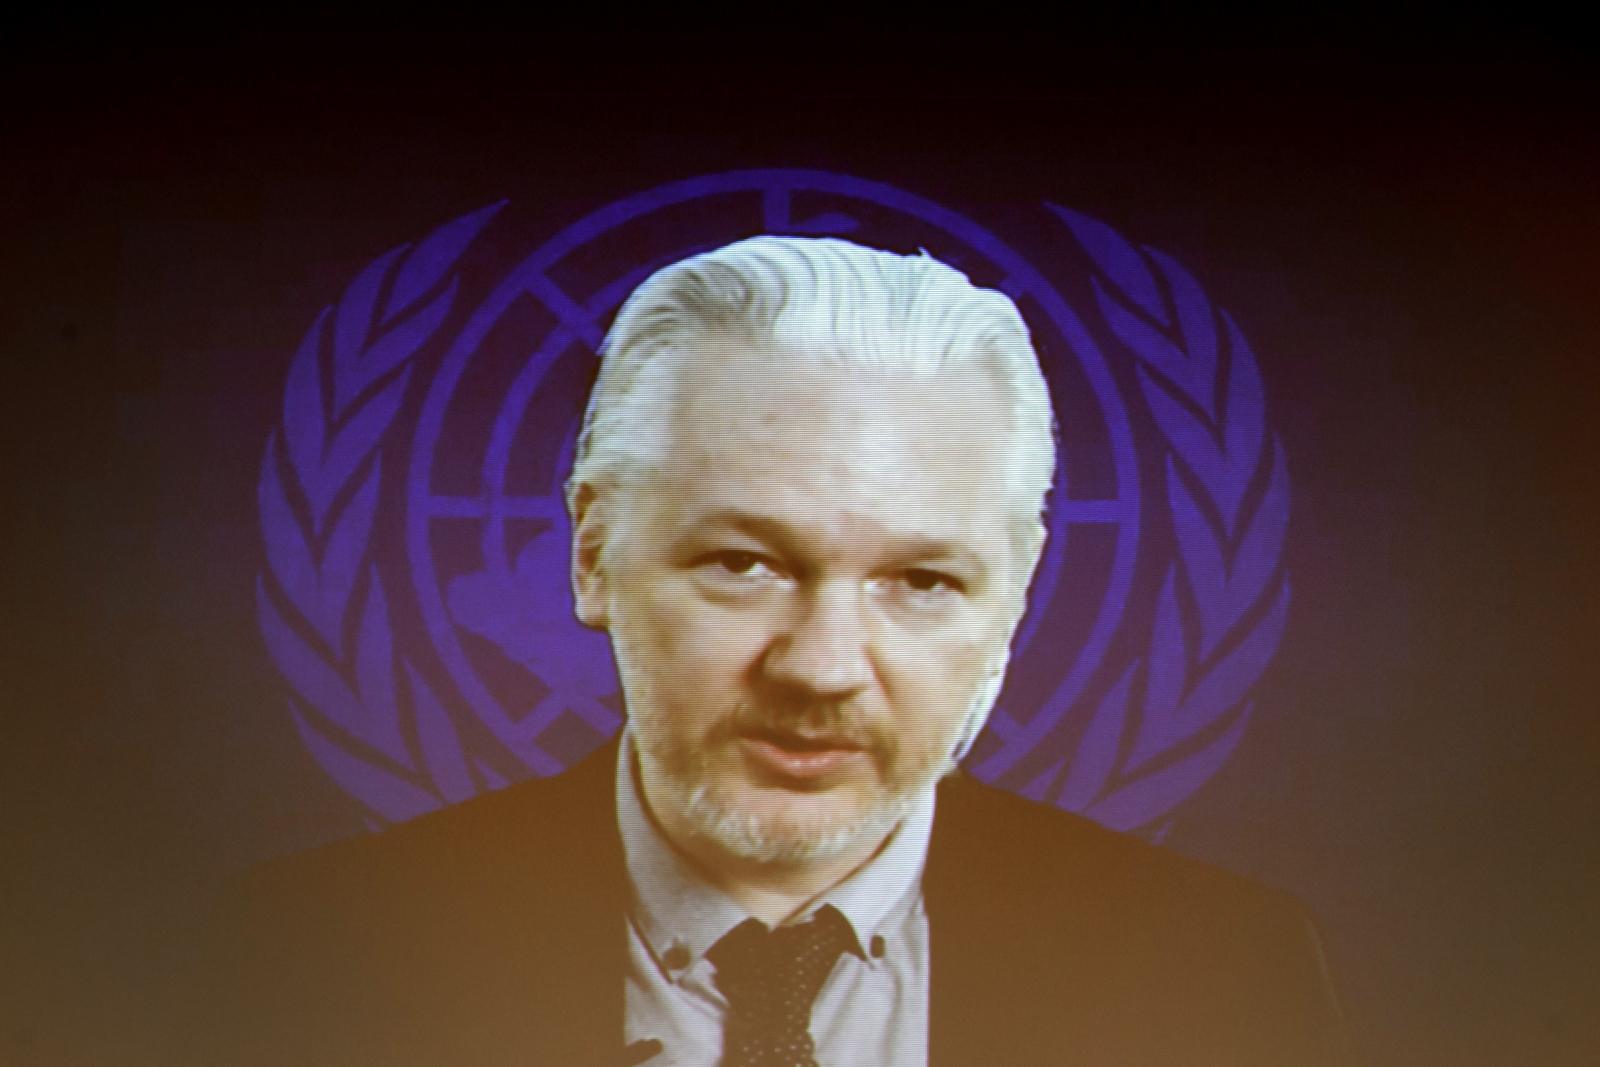 Julian Assange speaking via webcast to UN